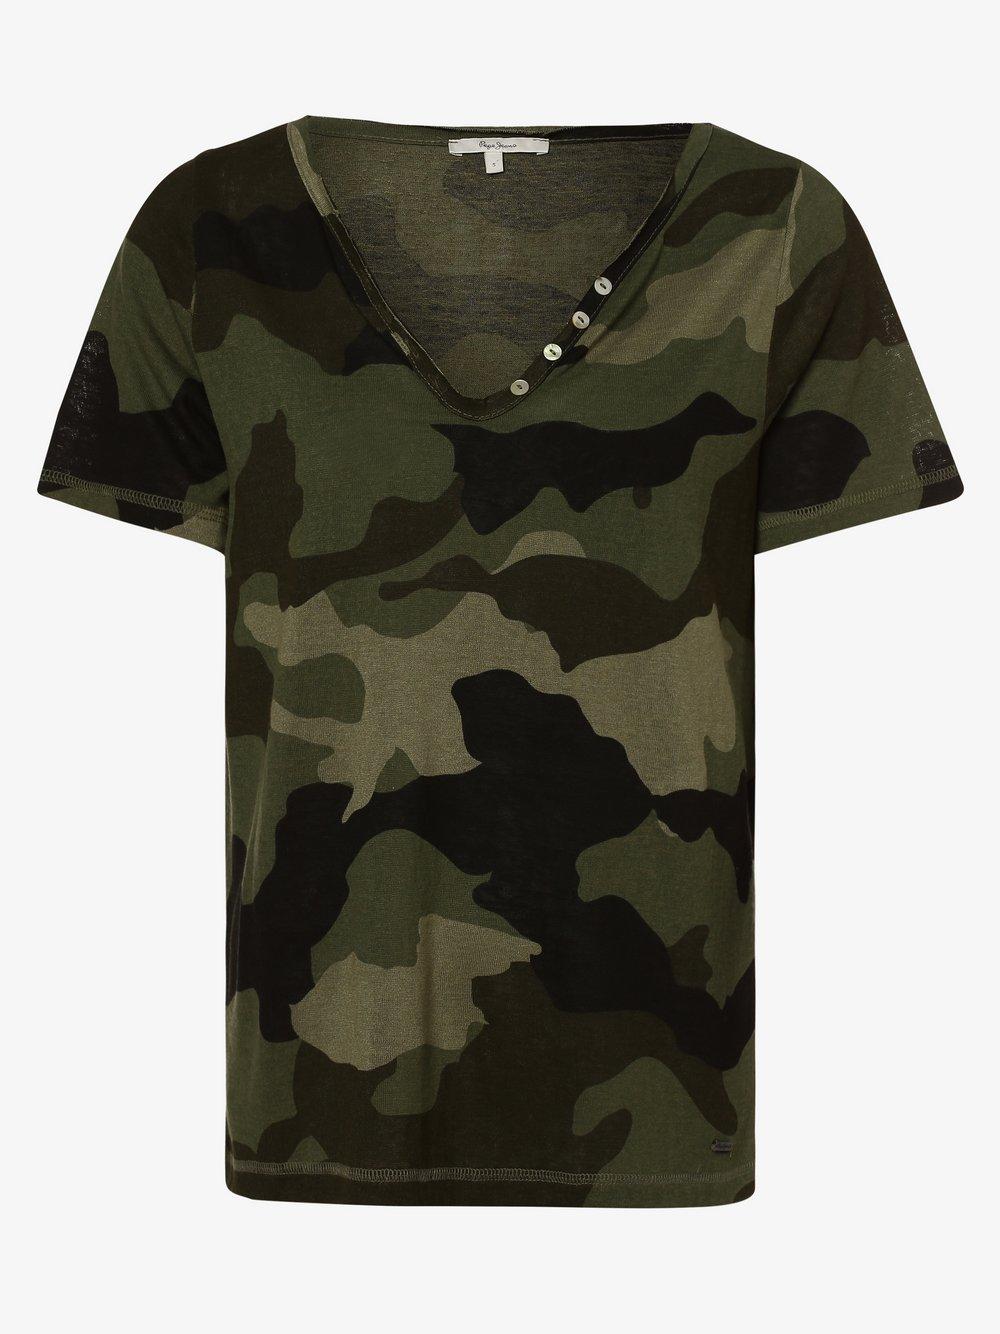 Pepe Jeans - T-shirt damski – Cami, zielony